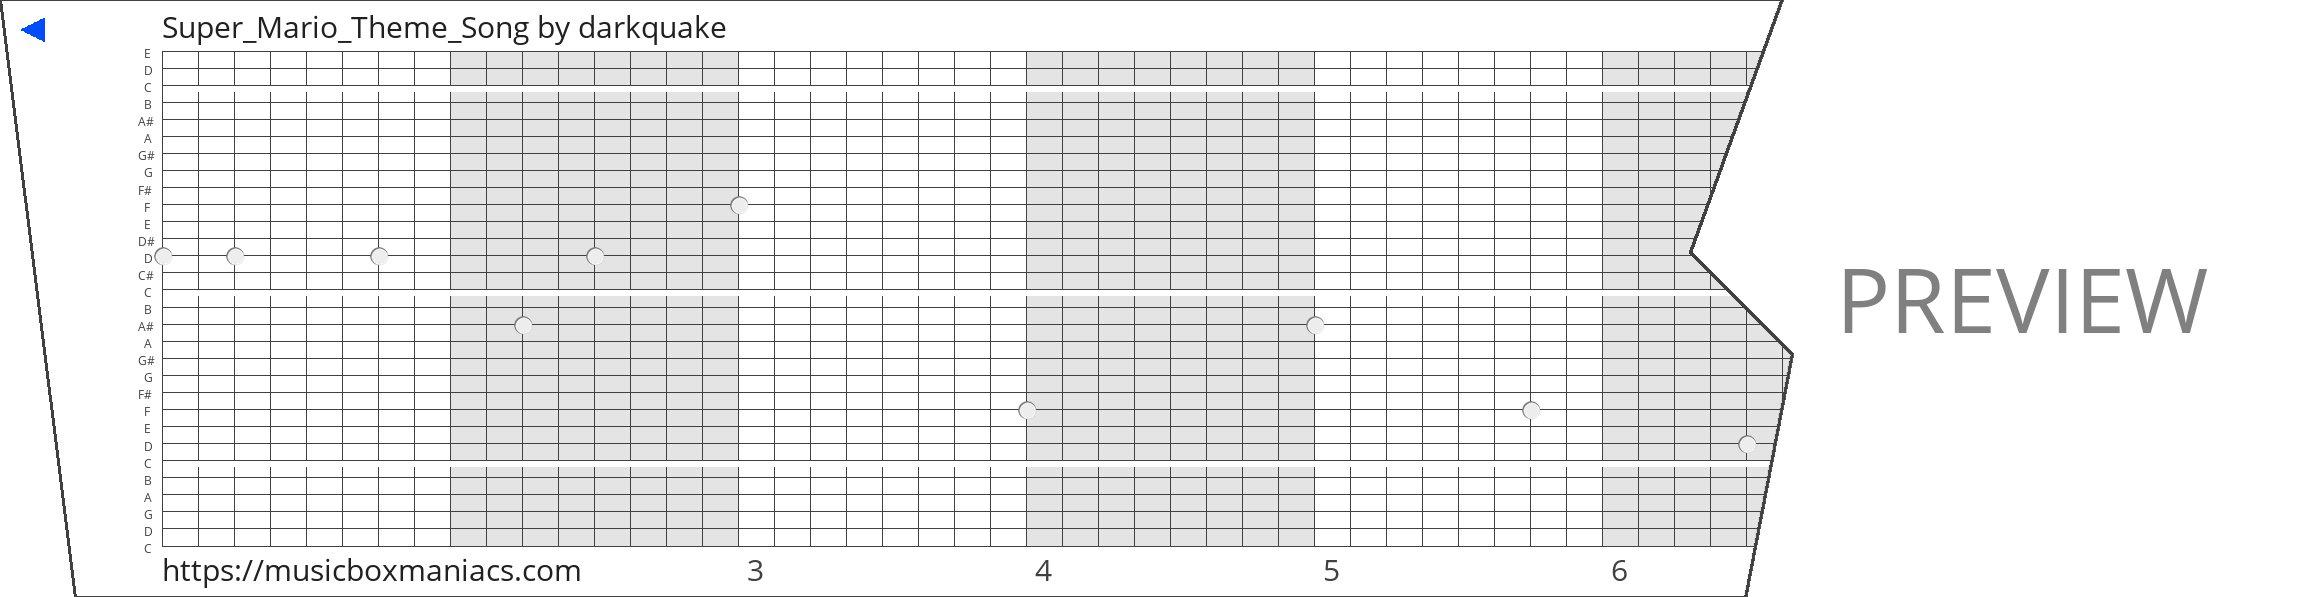 Super_Mario_Theme_Song 30 note music box paper strip